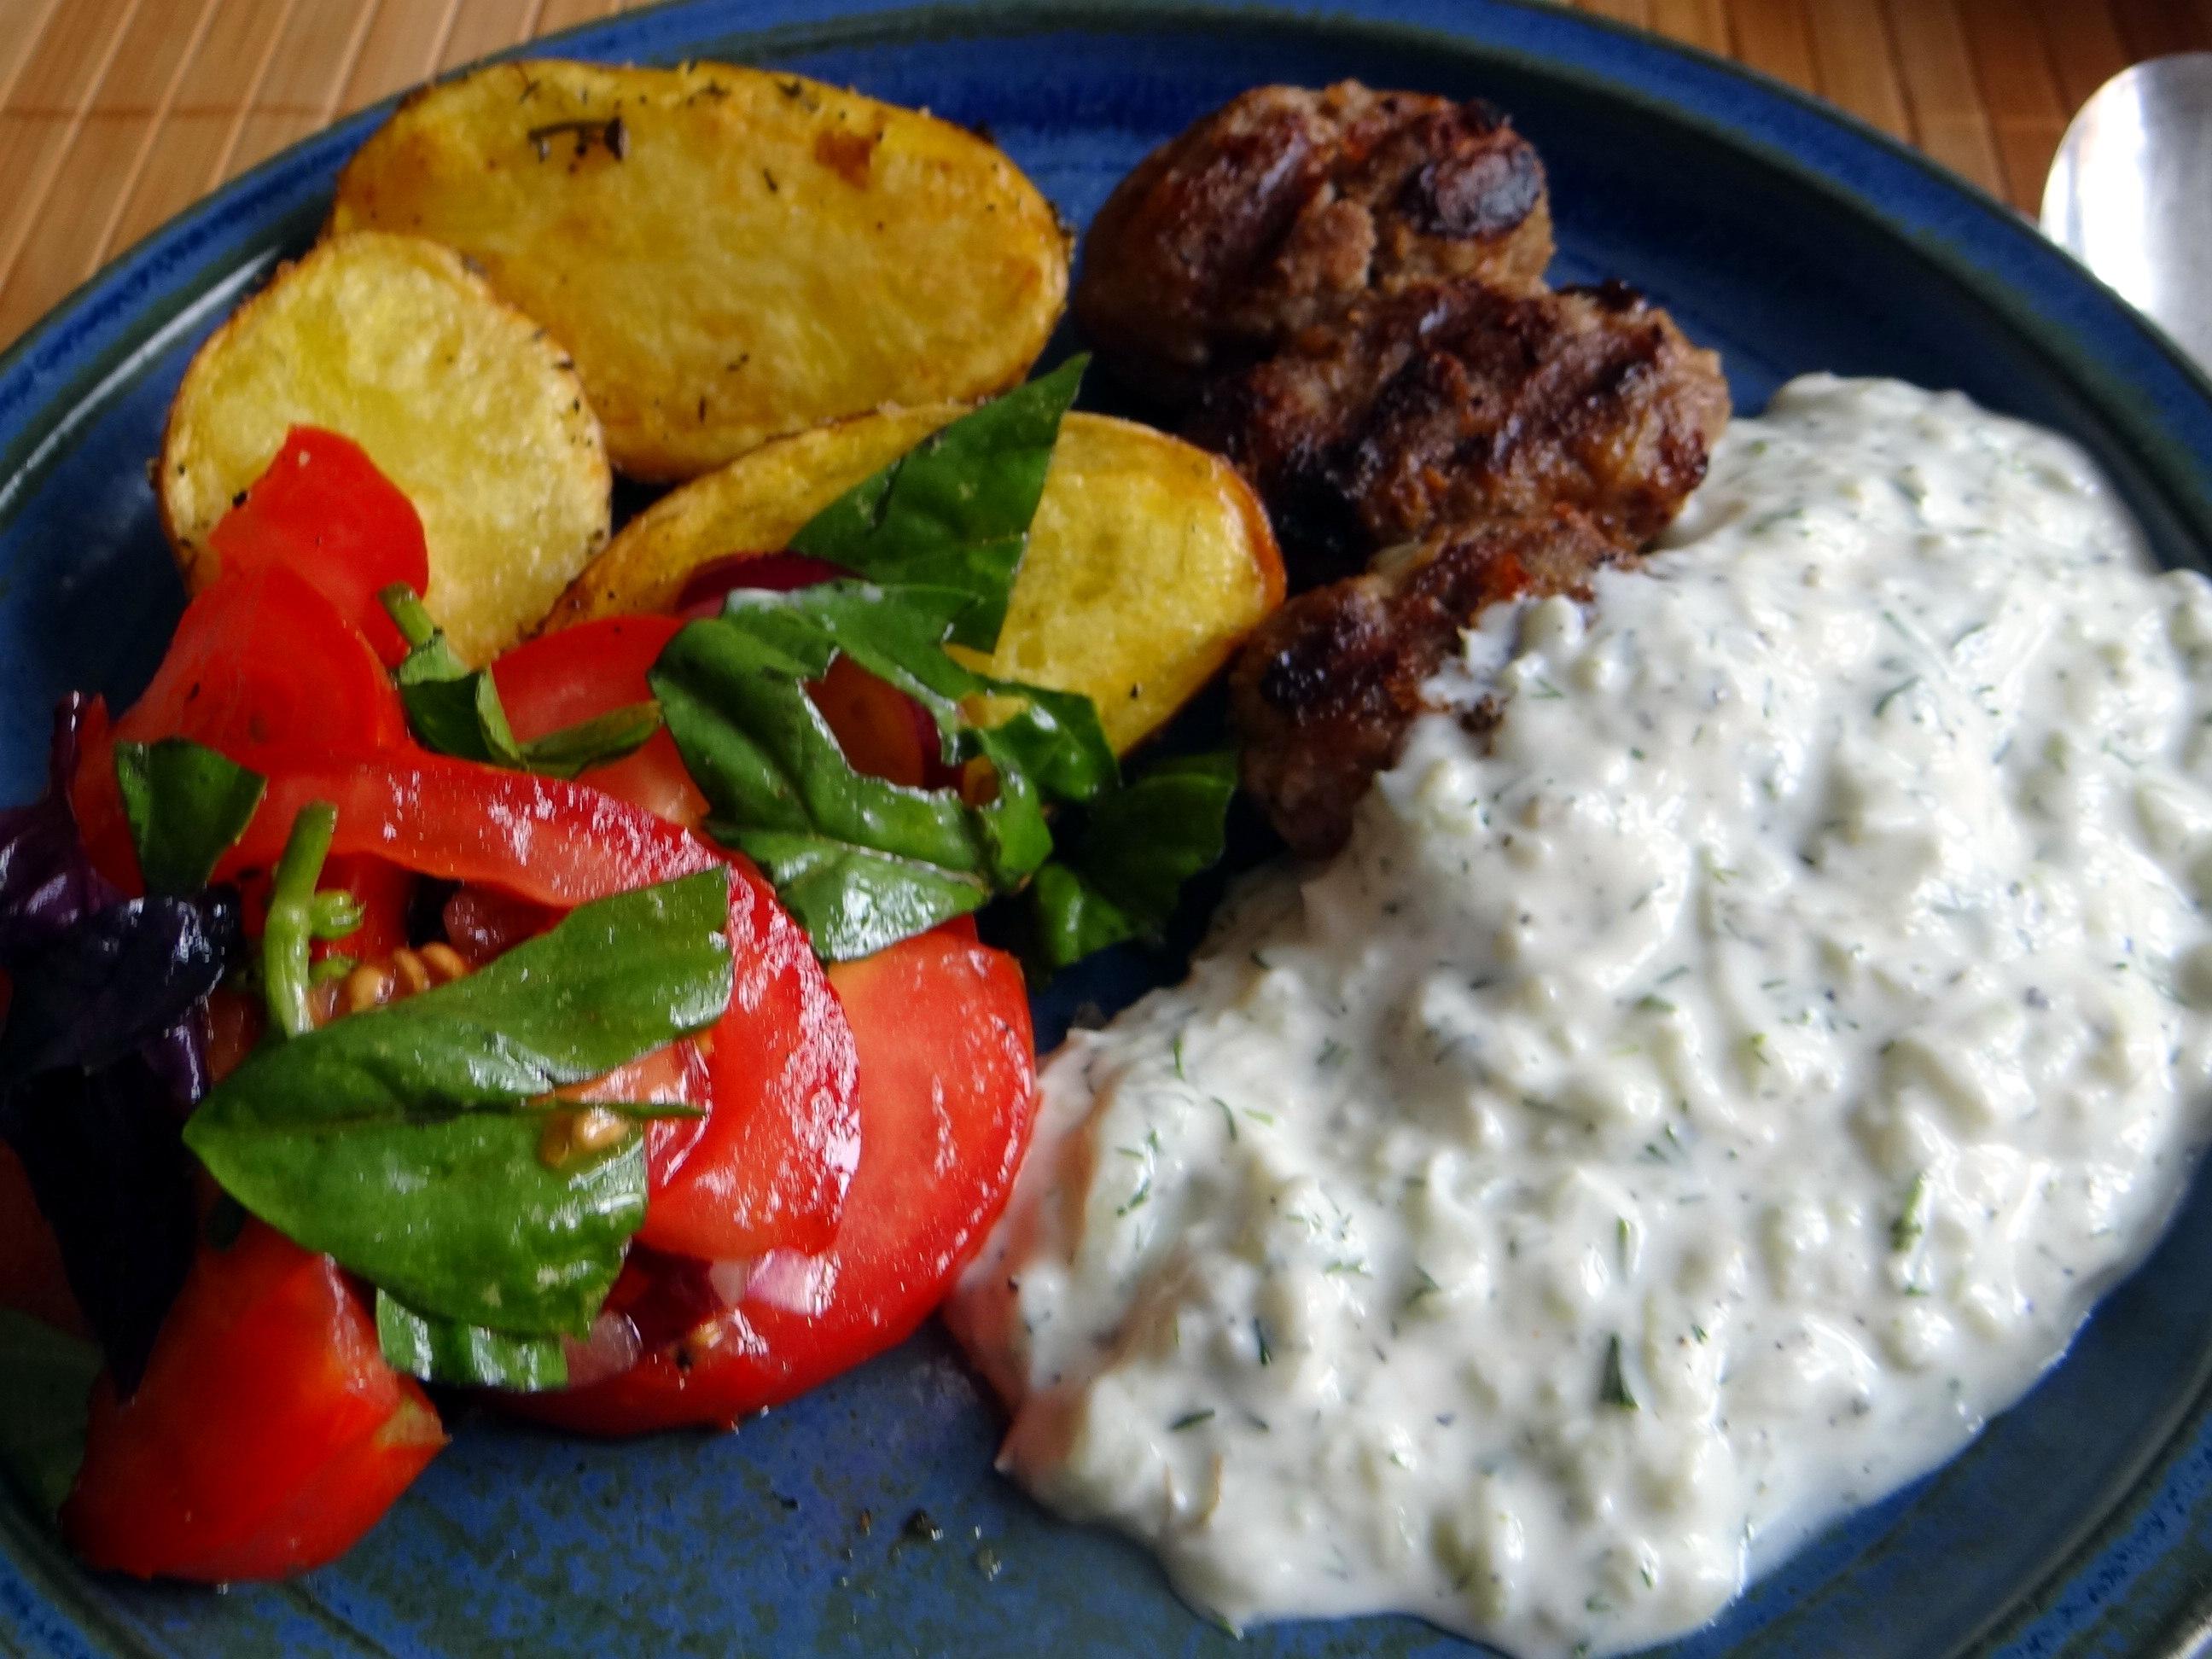 Cevapcici,Tzatziki,Ofenkartoffeln,Tomatensalat,Smoothie (3)